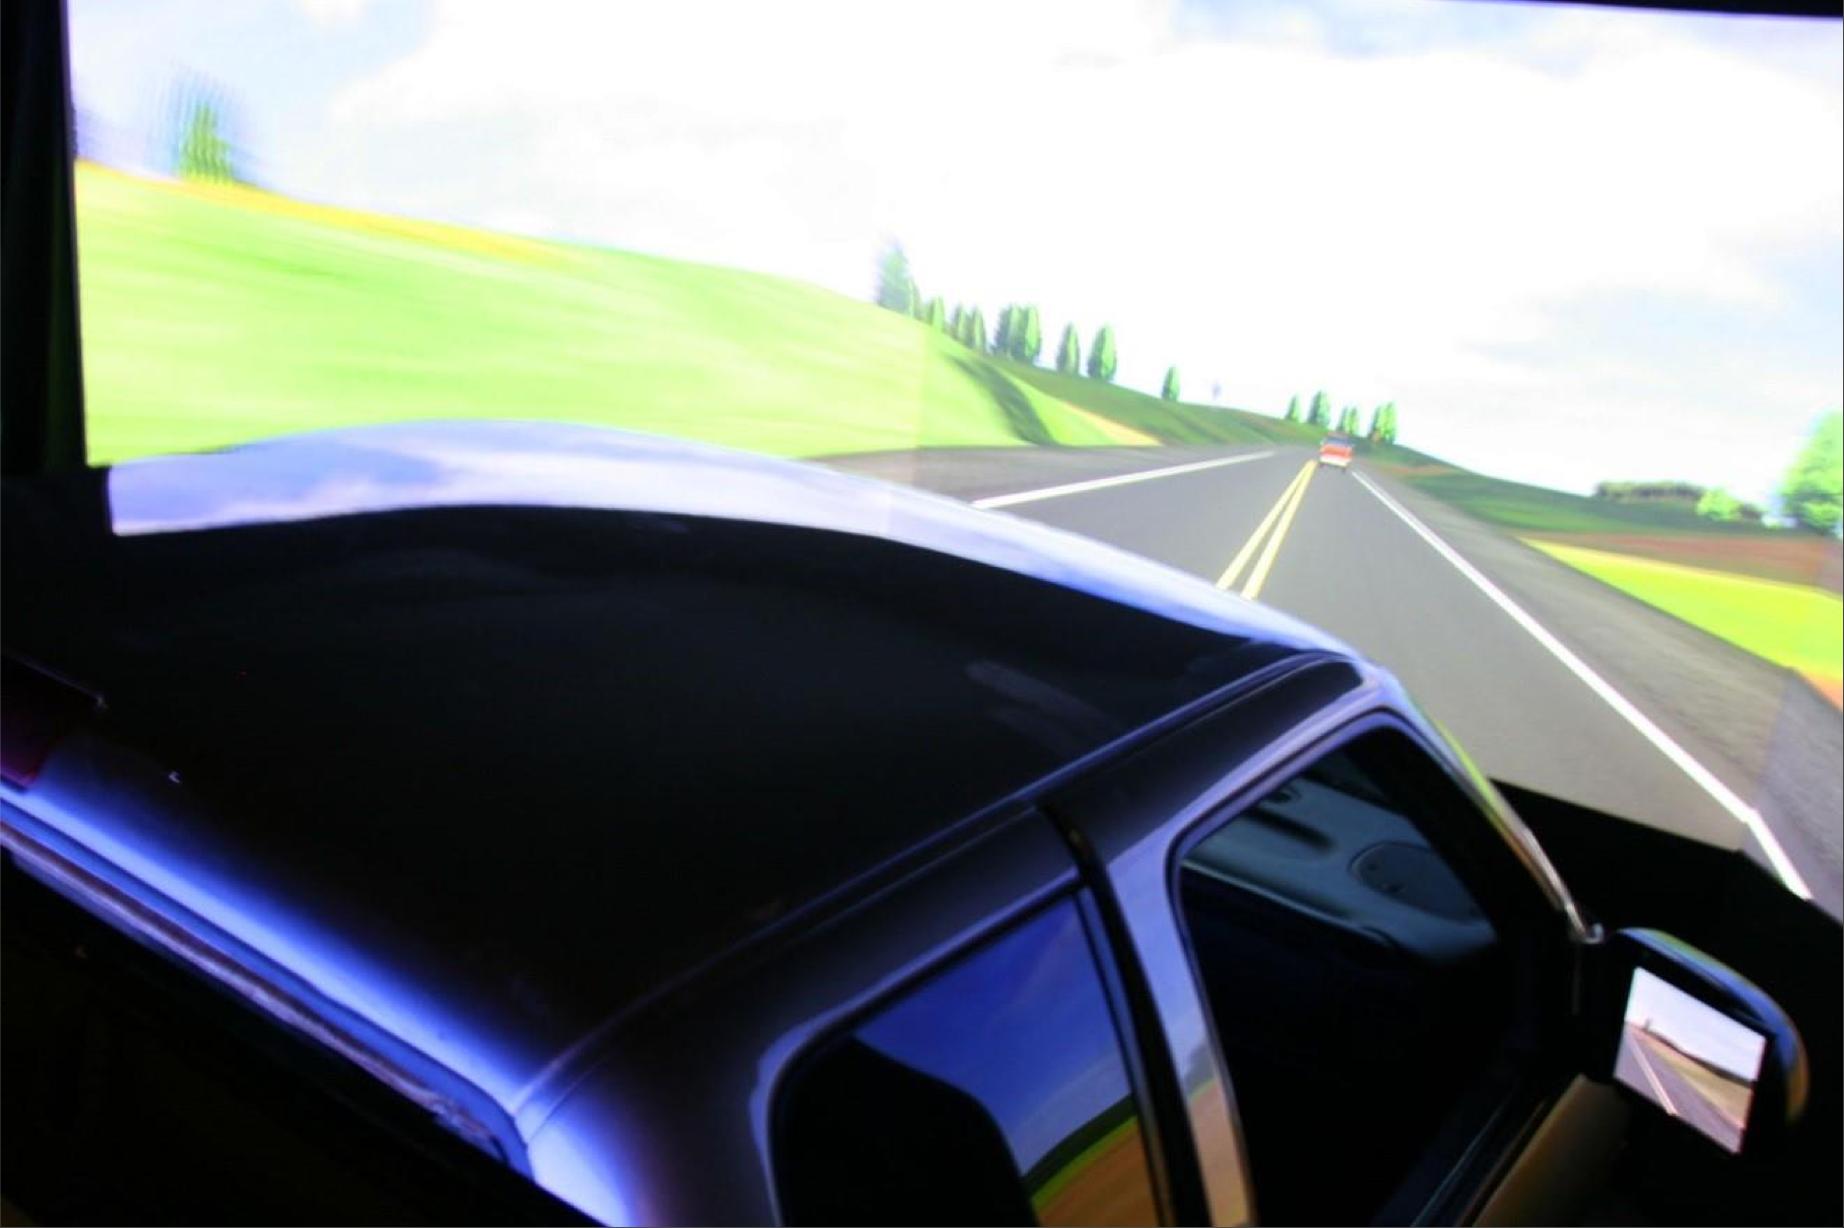 Real cab - virtual road